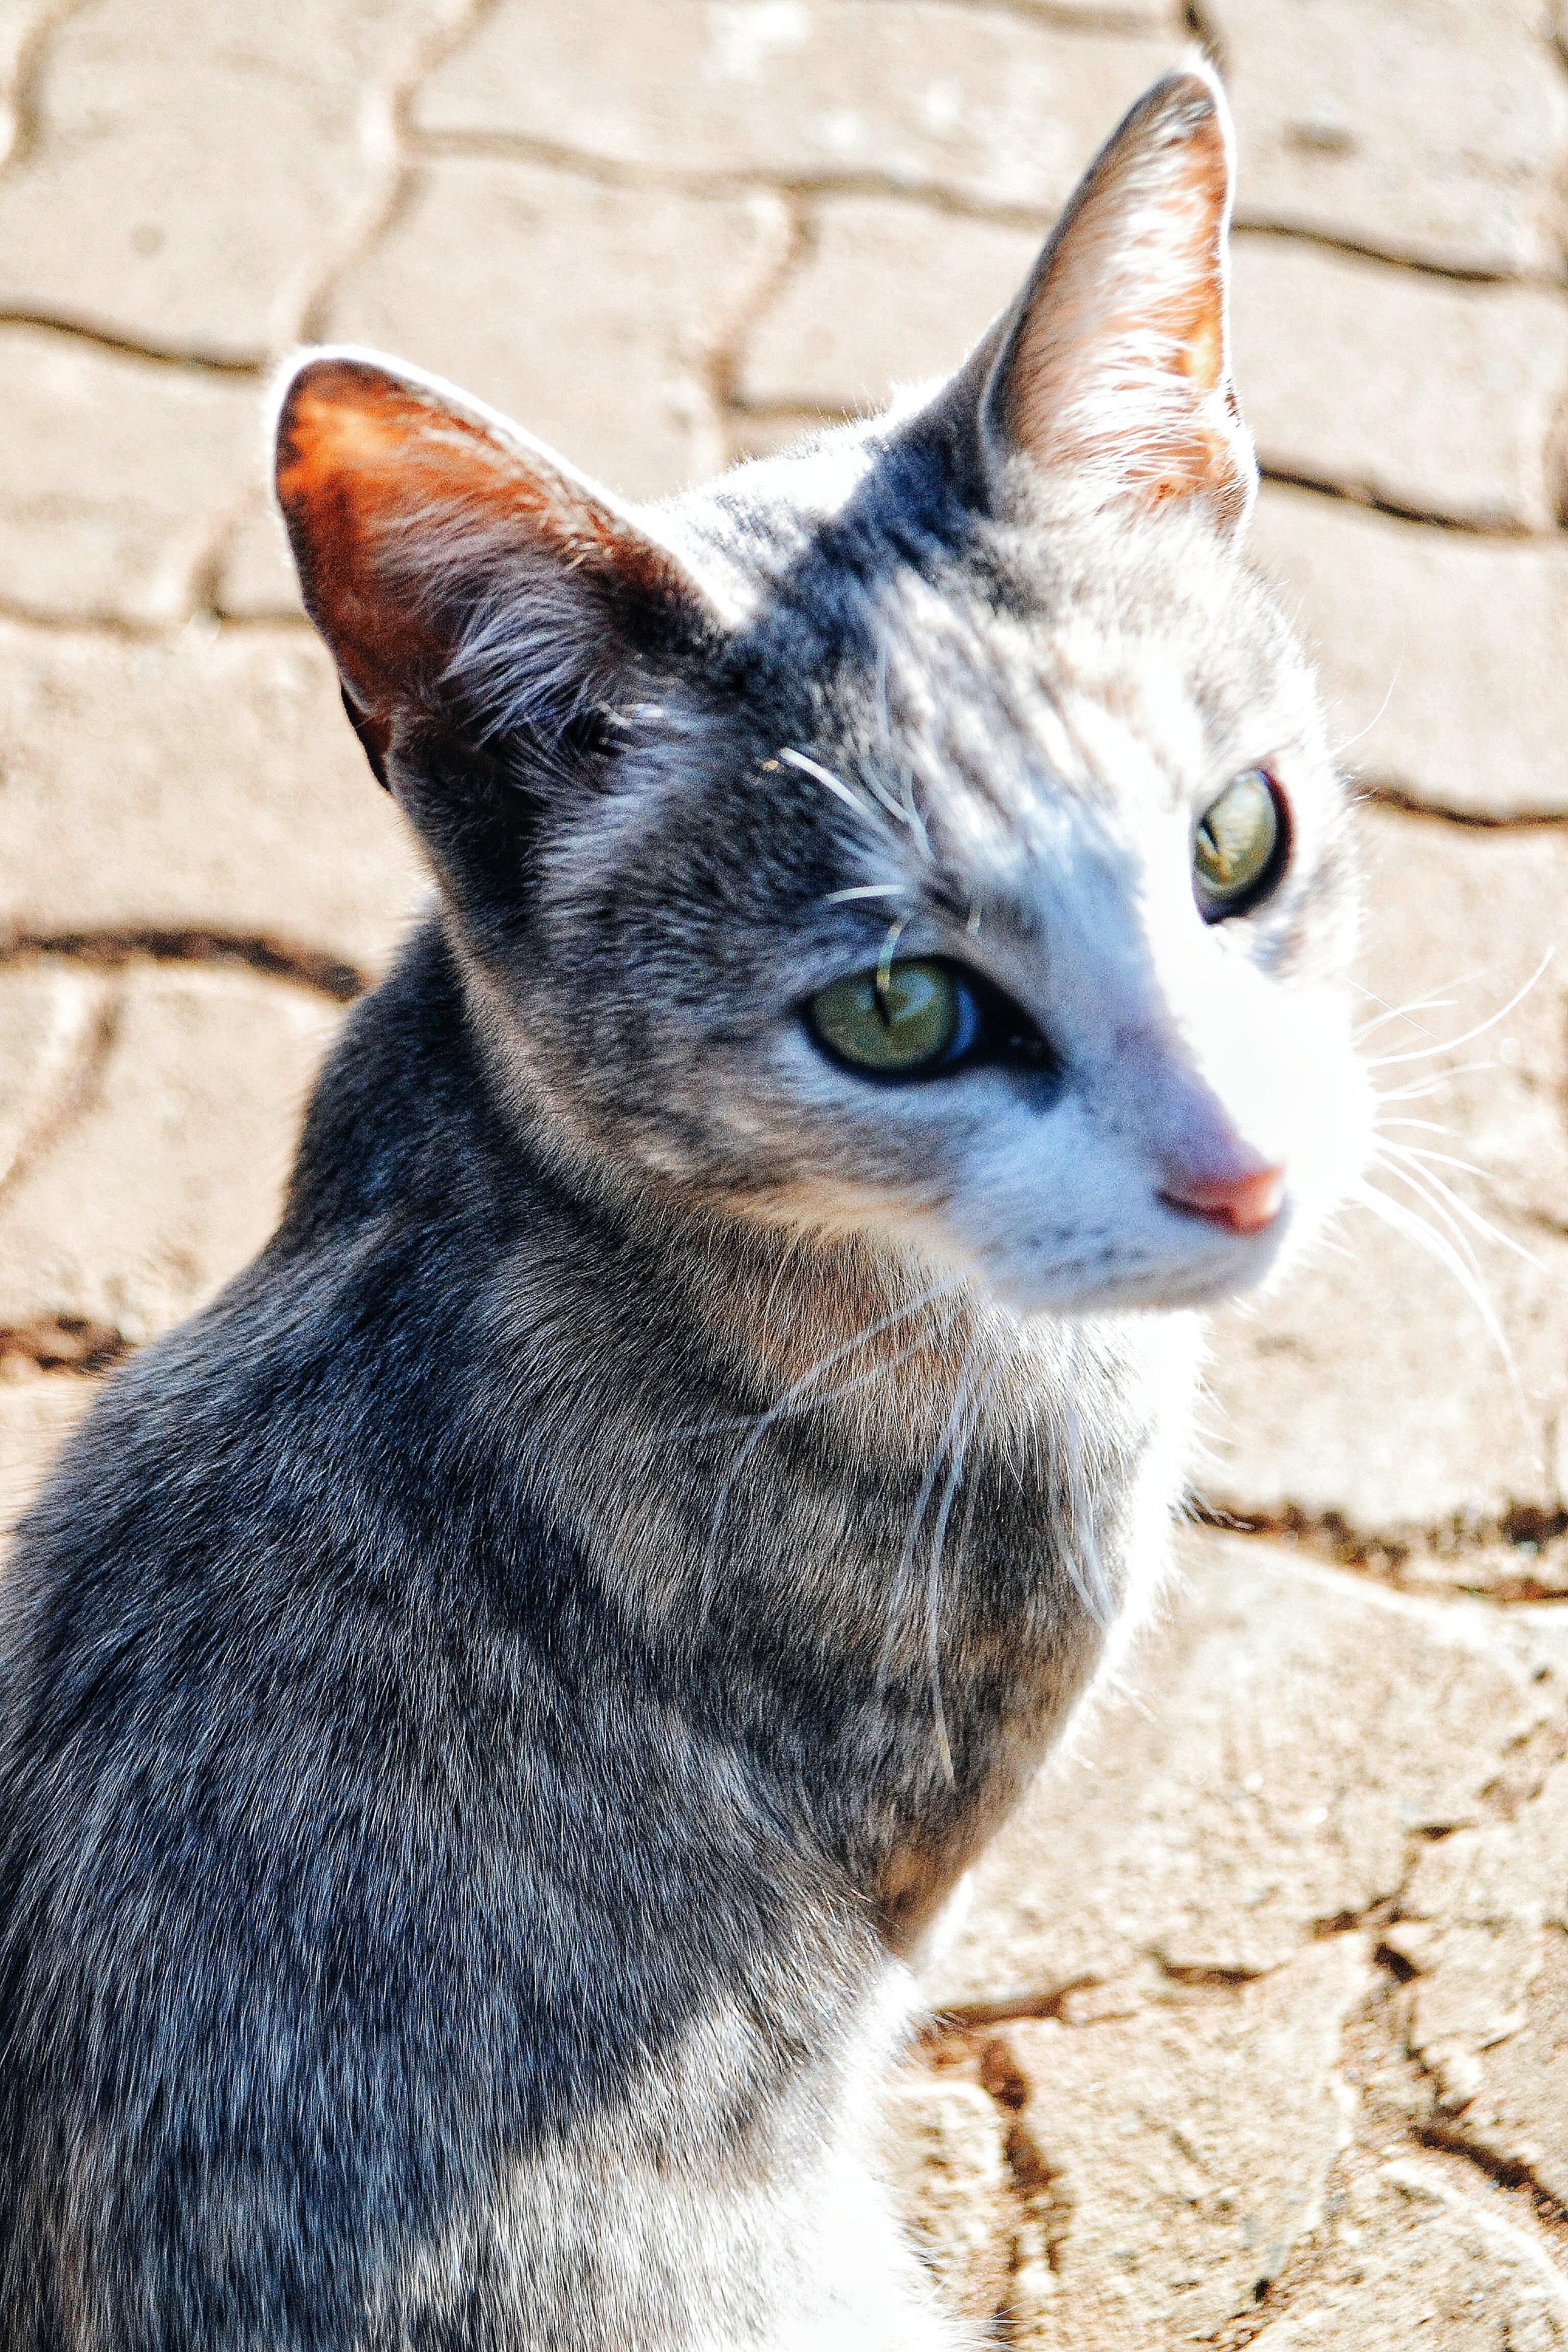 Free stock photo of animal, background, blurr, cat